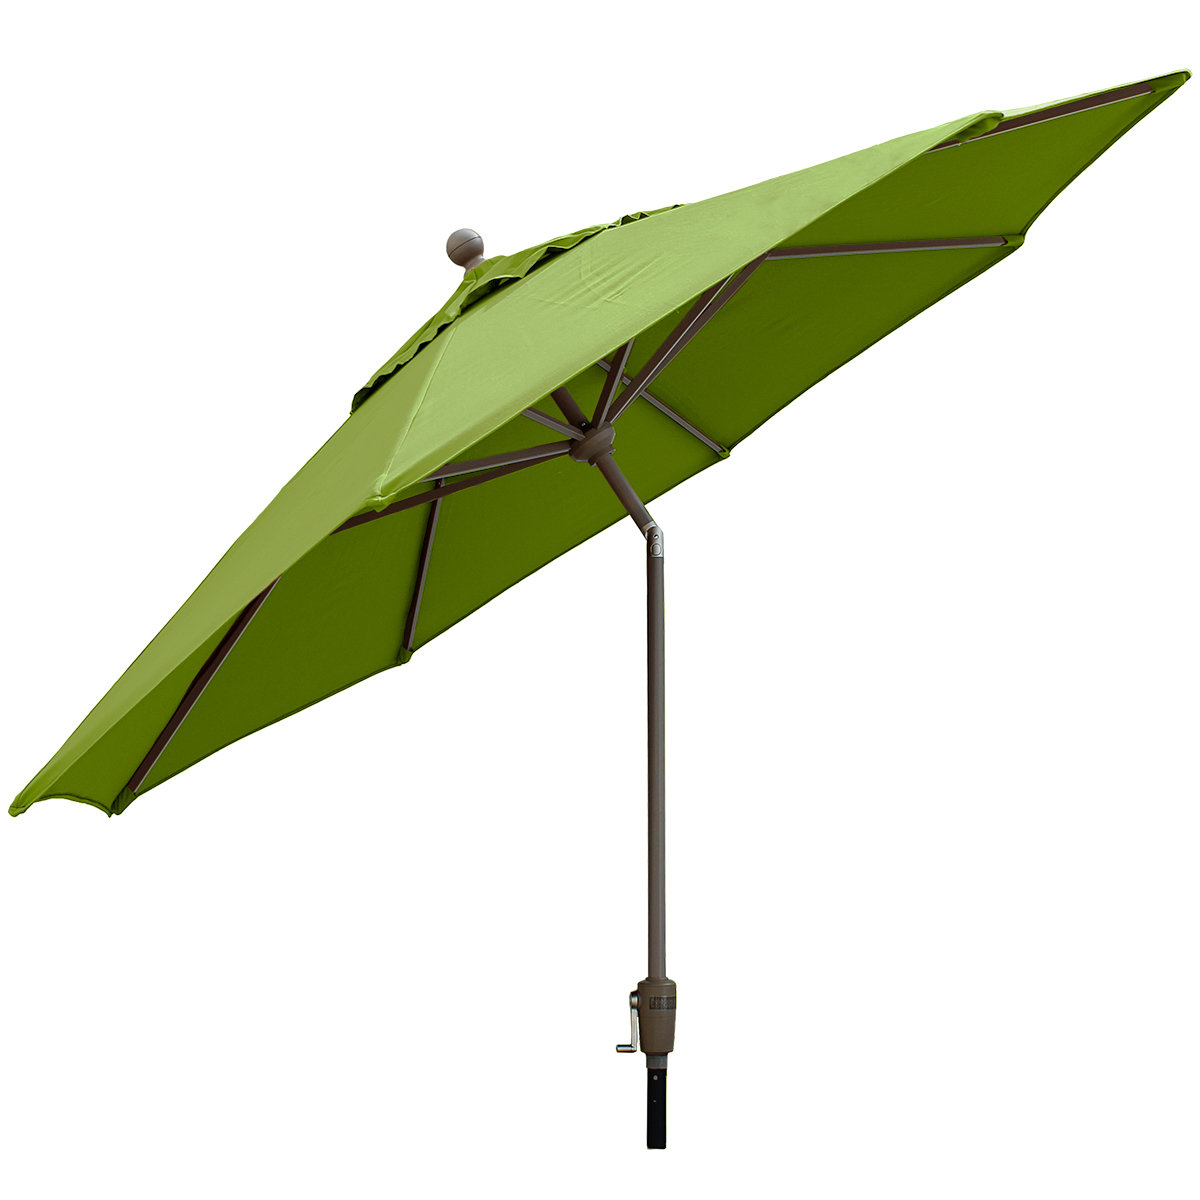 Three Posts Crowland 9' Market Sunbrella Umbrella In Most Current Crowland Market Sunbrella Umbrellas (View 12 of 20)